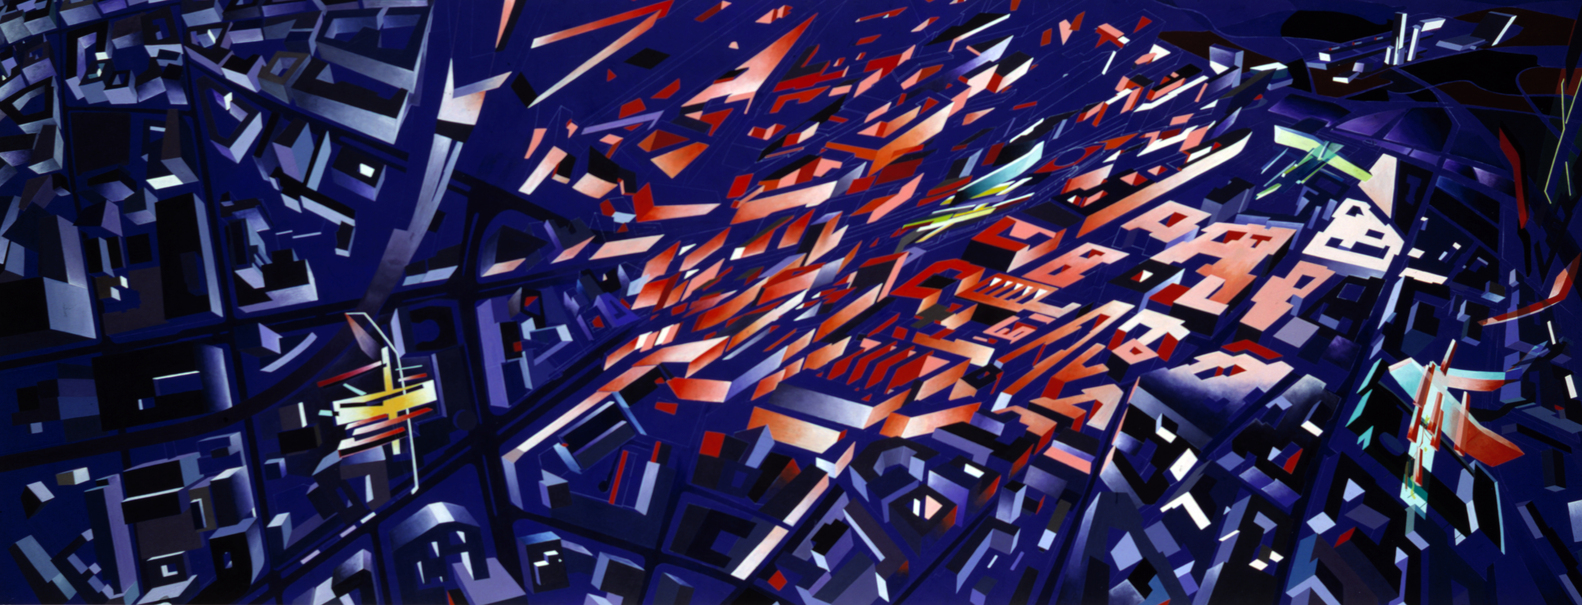 """victoria city aerial perspective"" zaha hadid 1988"